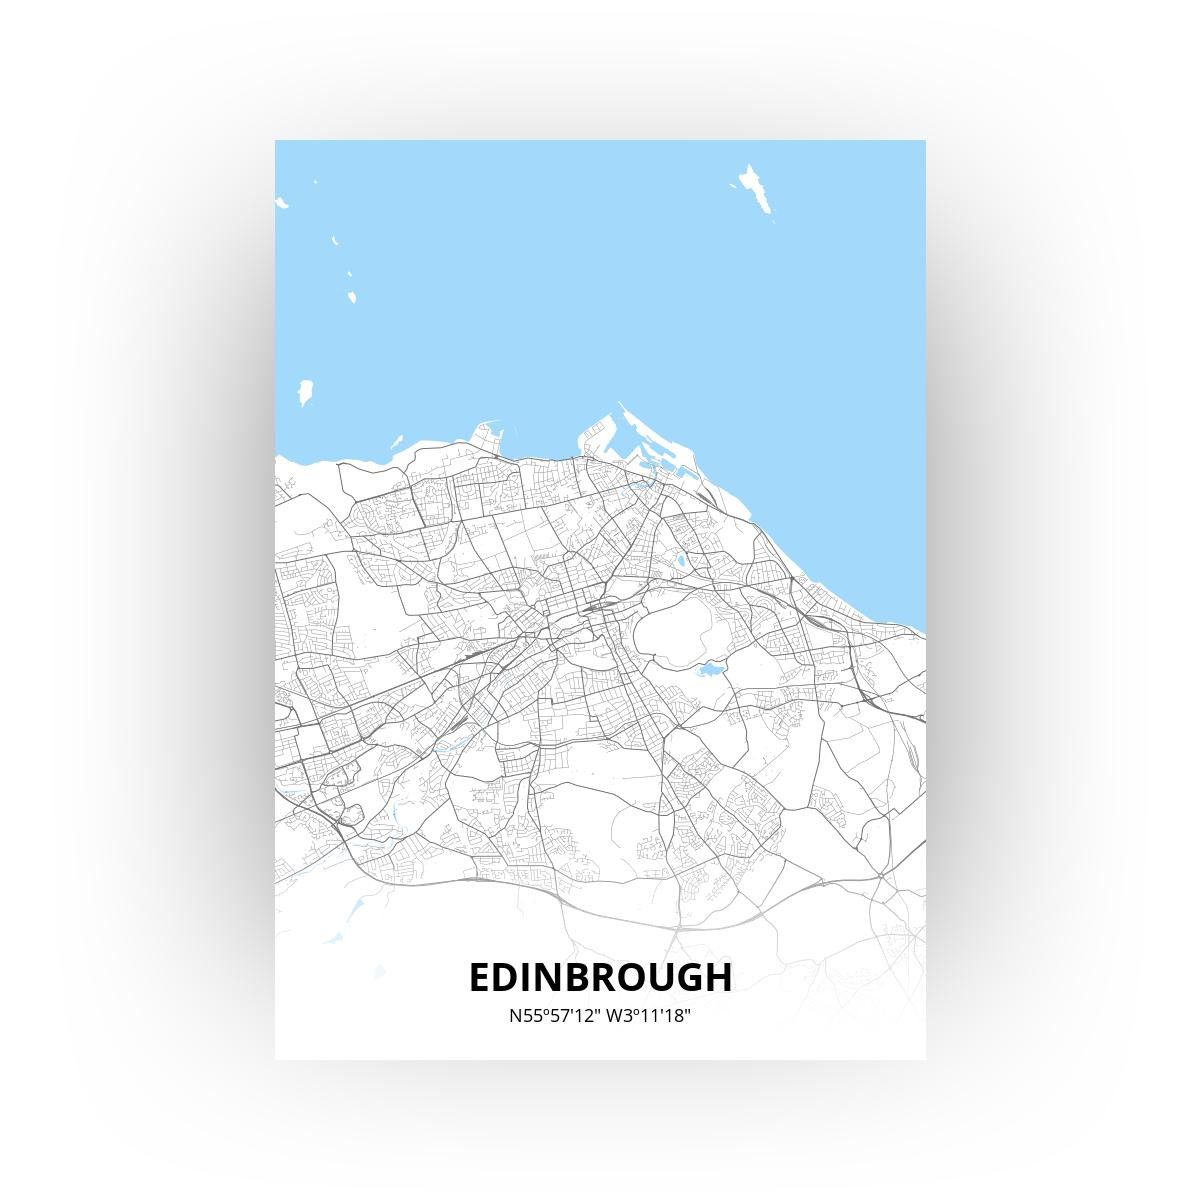 Edinbrough print - Standaard stijl